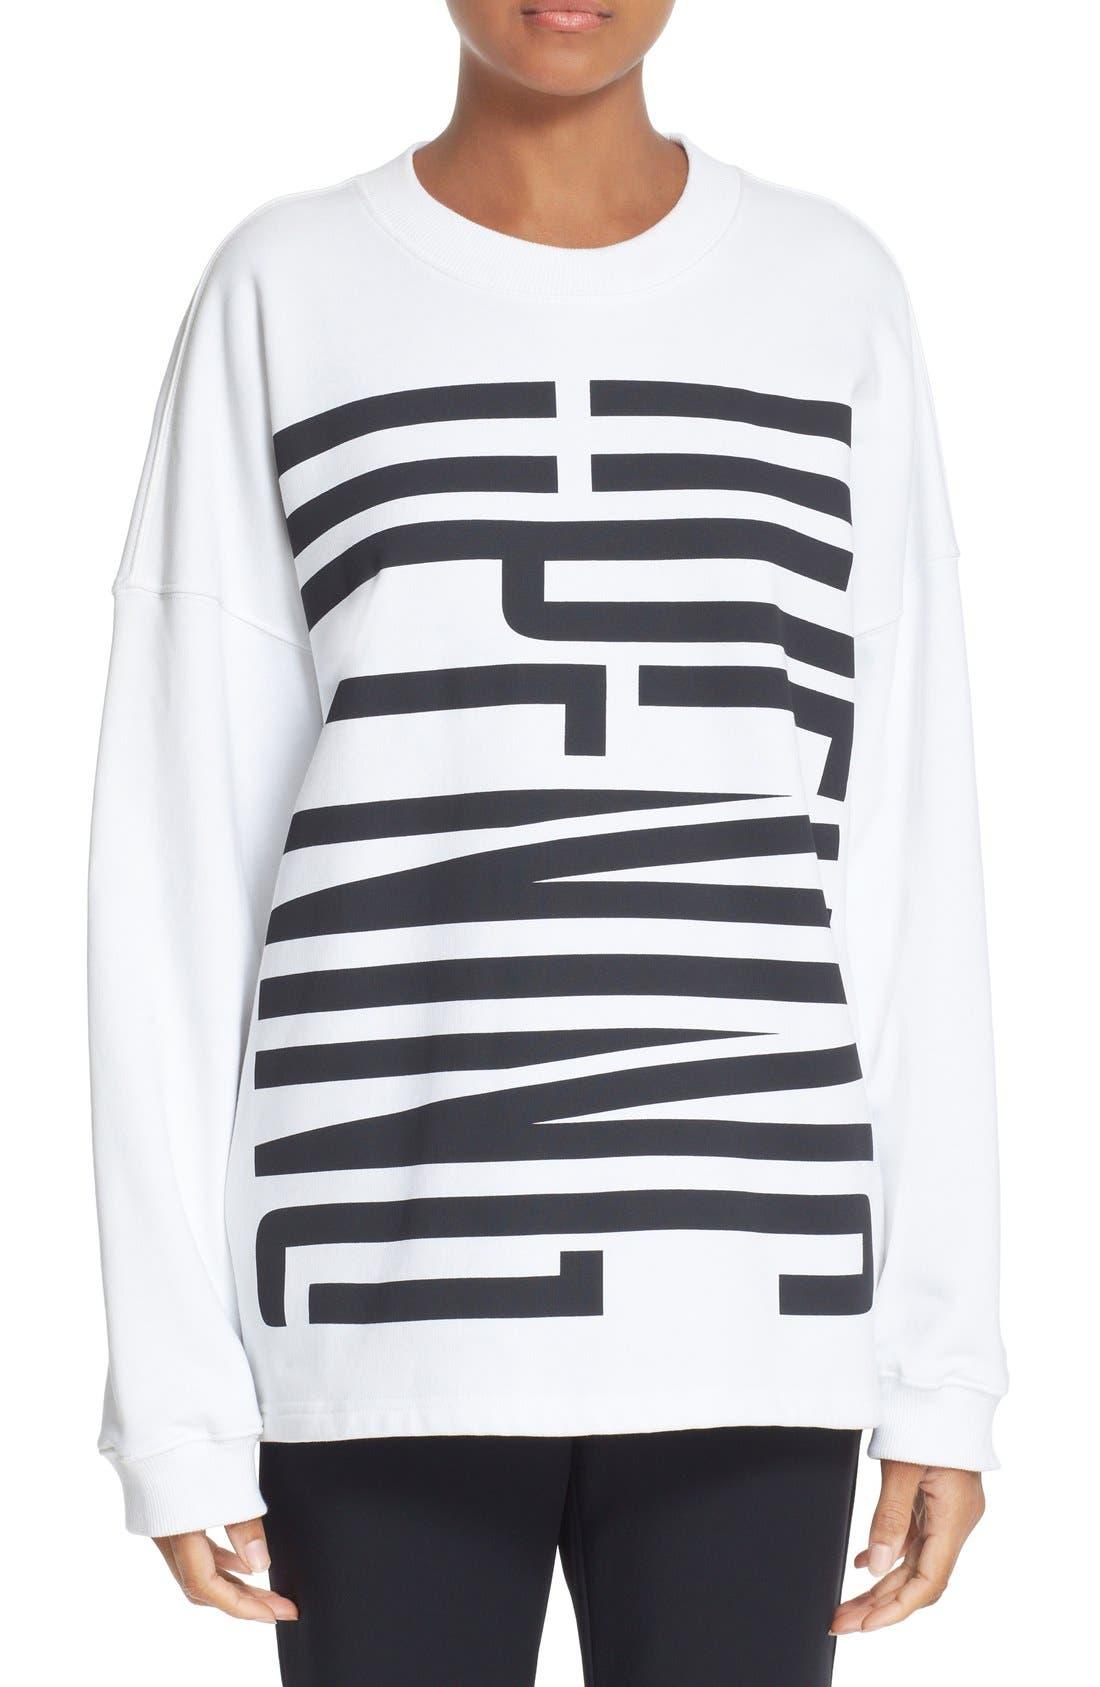 Alternate Image 1 Selected - Opening Ceremony Graphic Cotton Sweatshirt